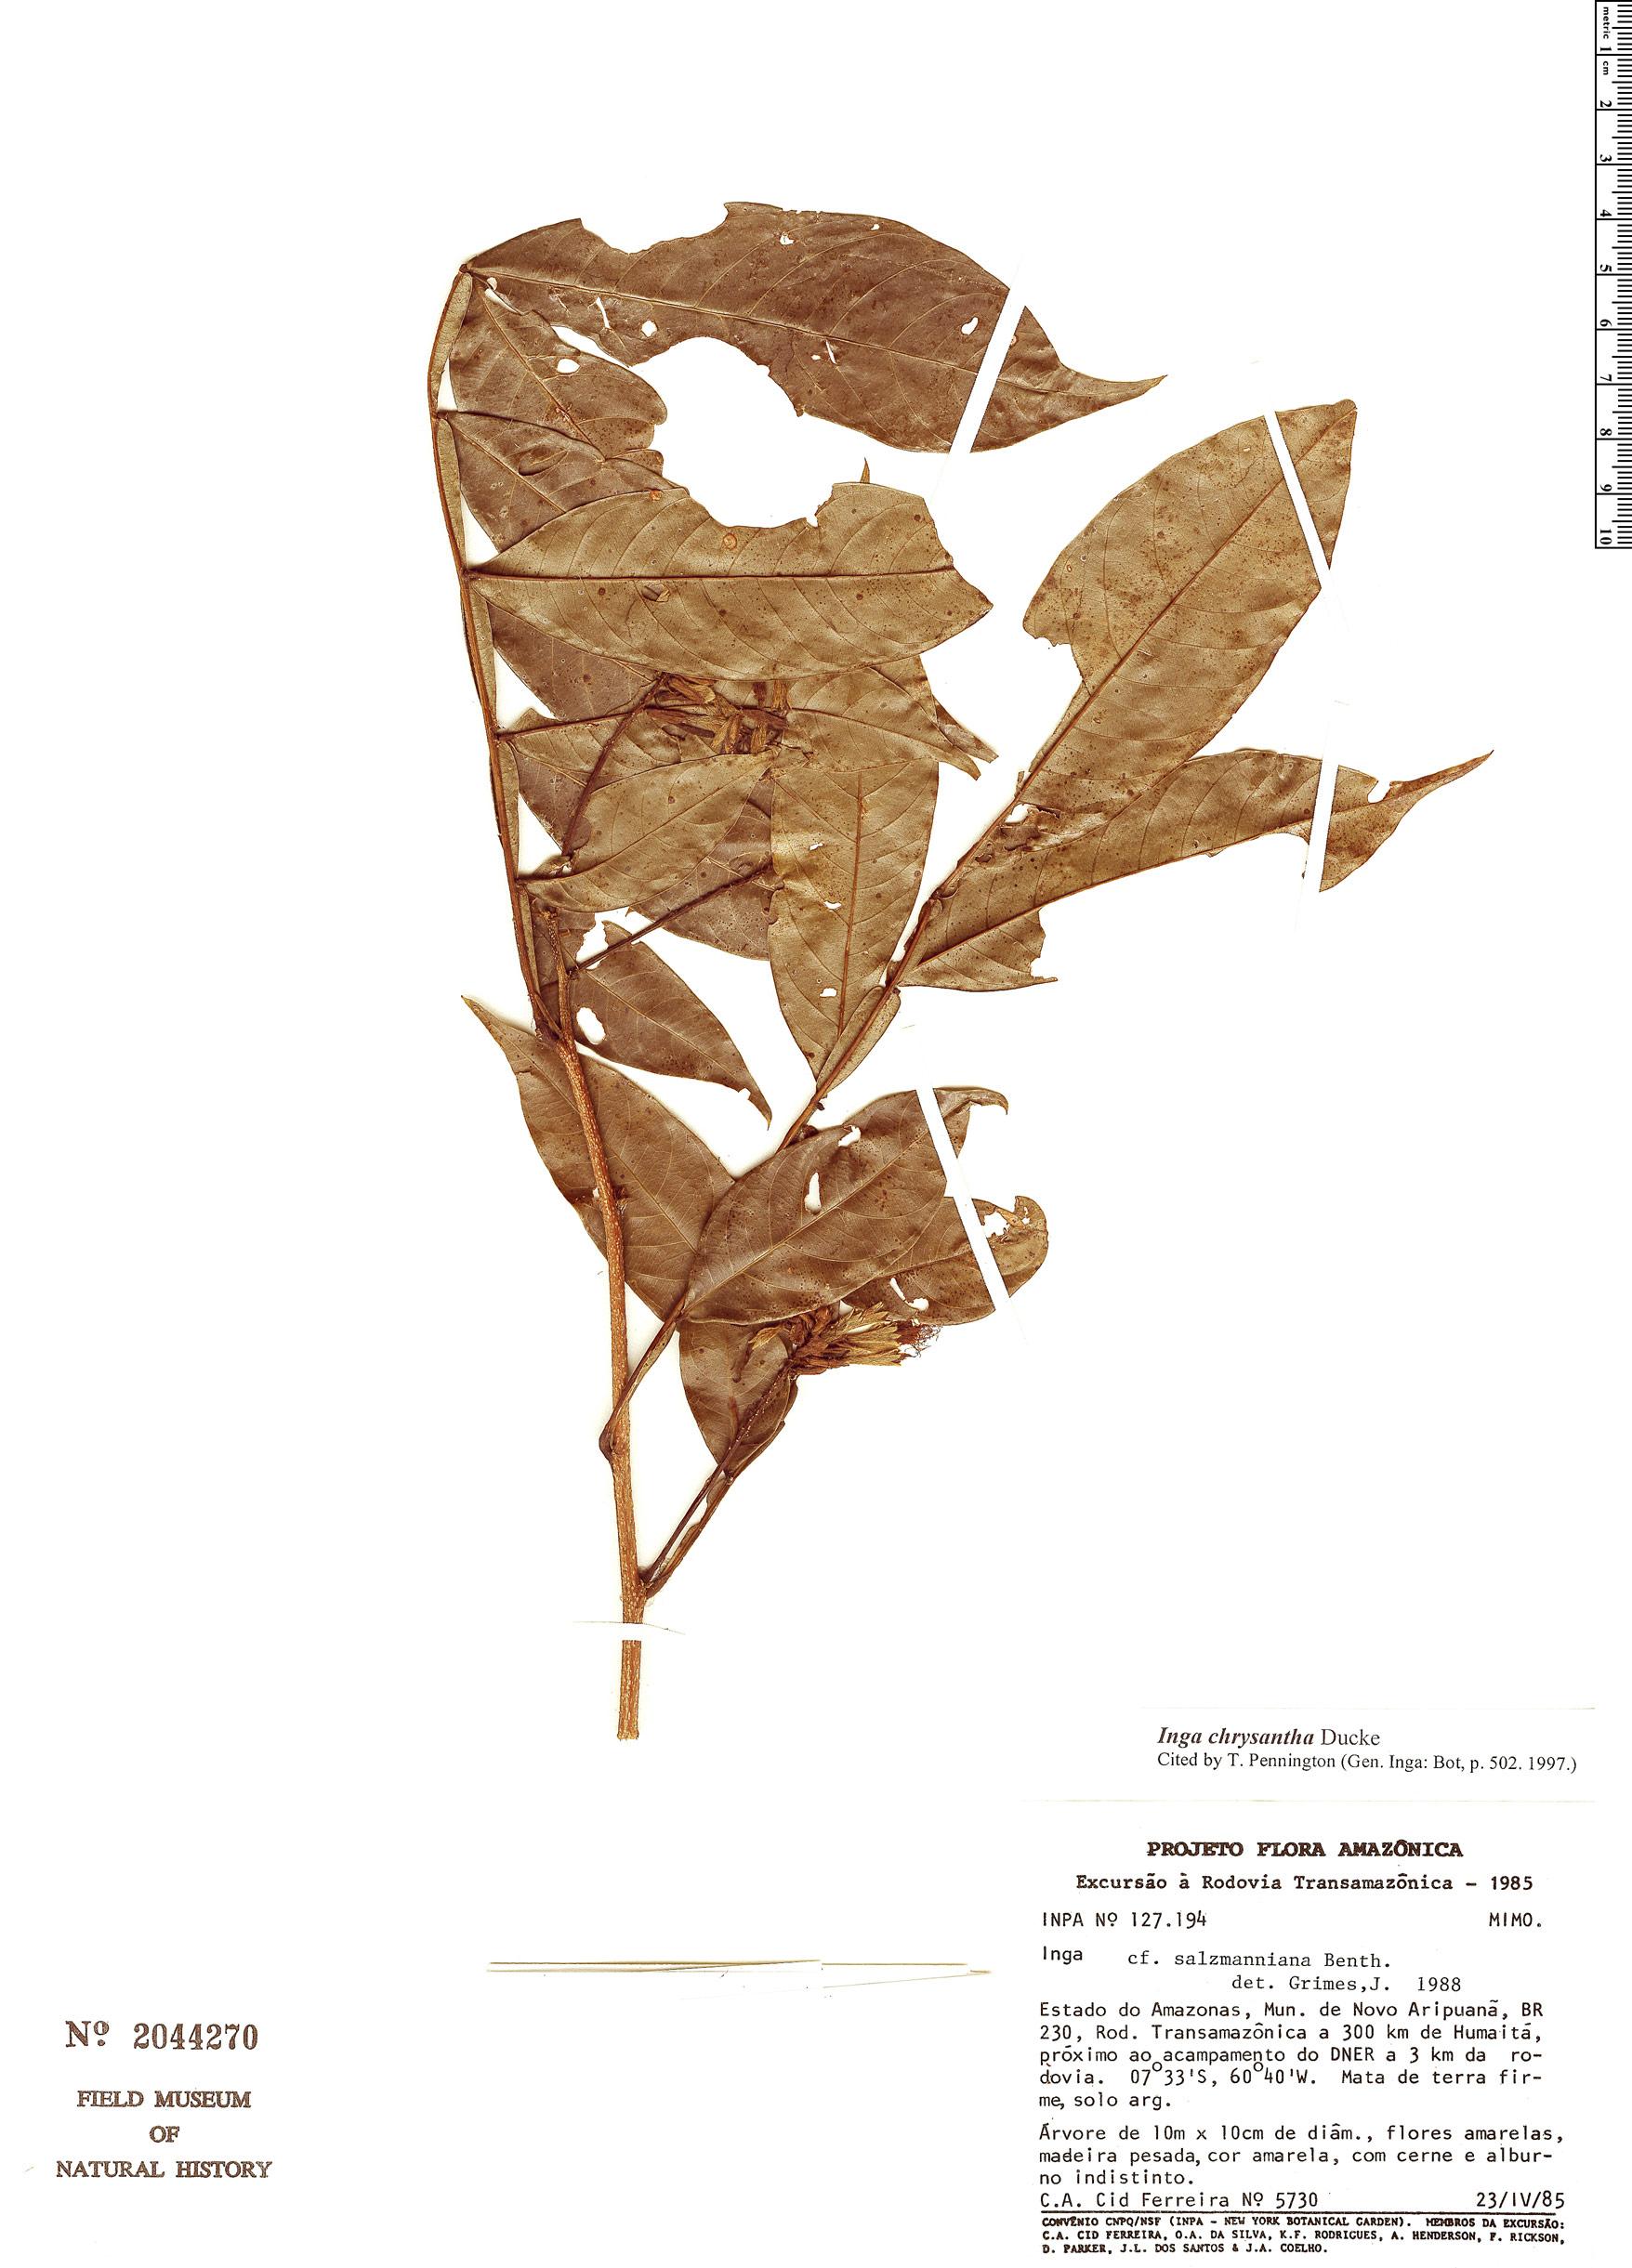 Specimen: Inga chrysantha